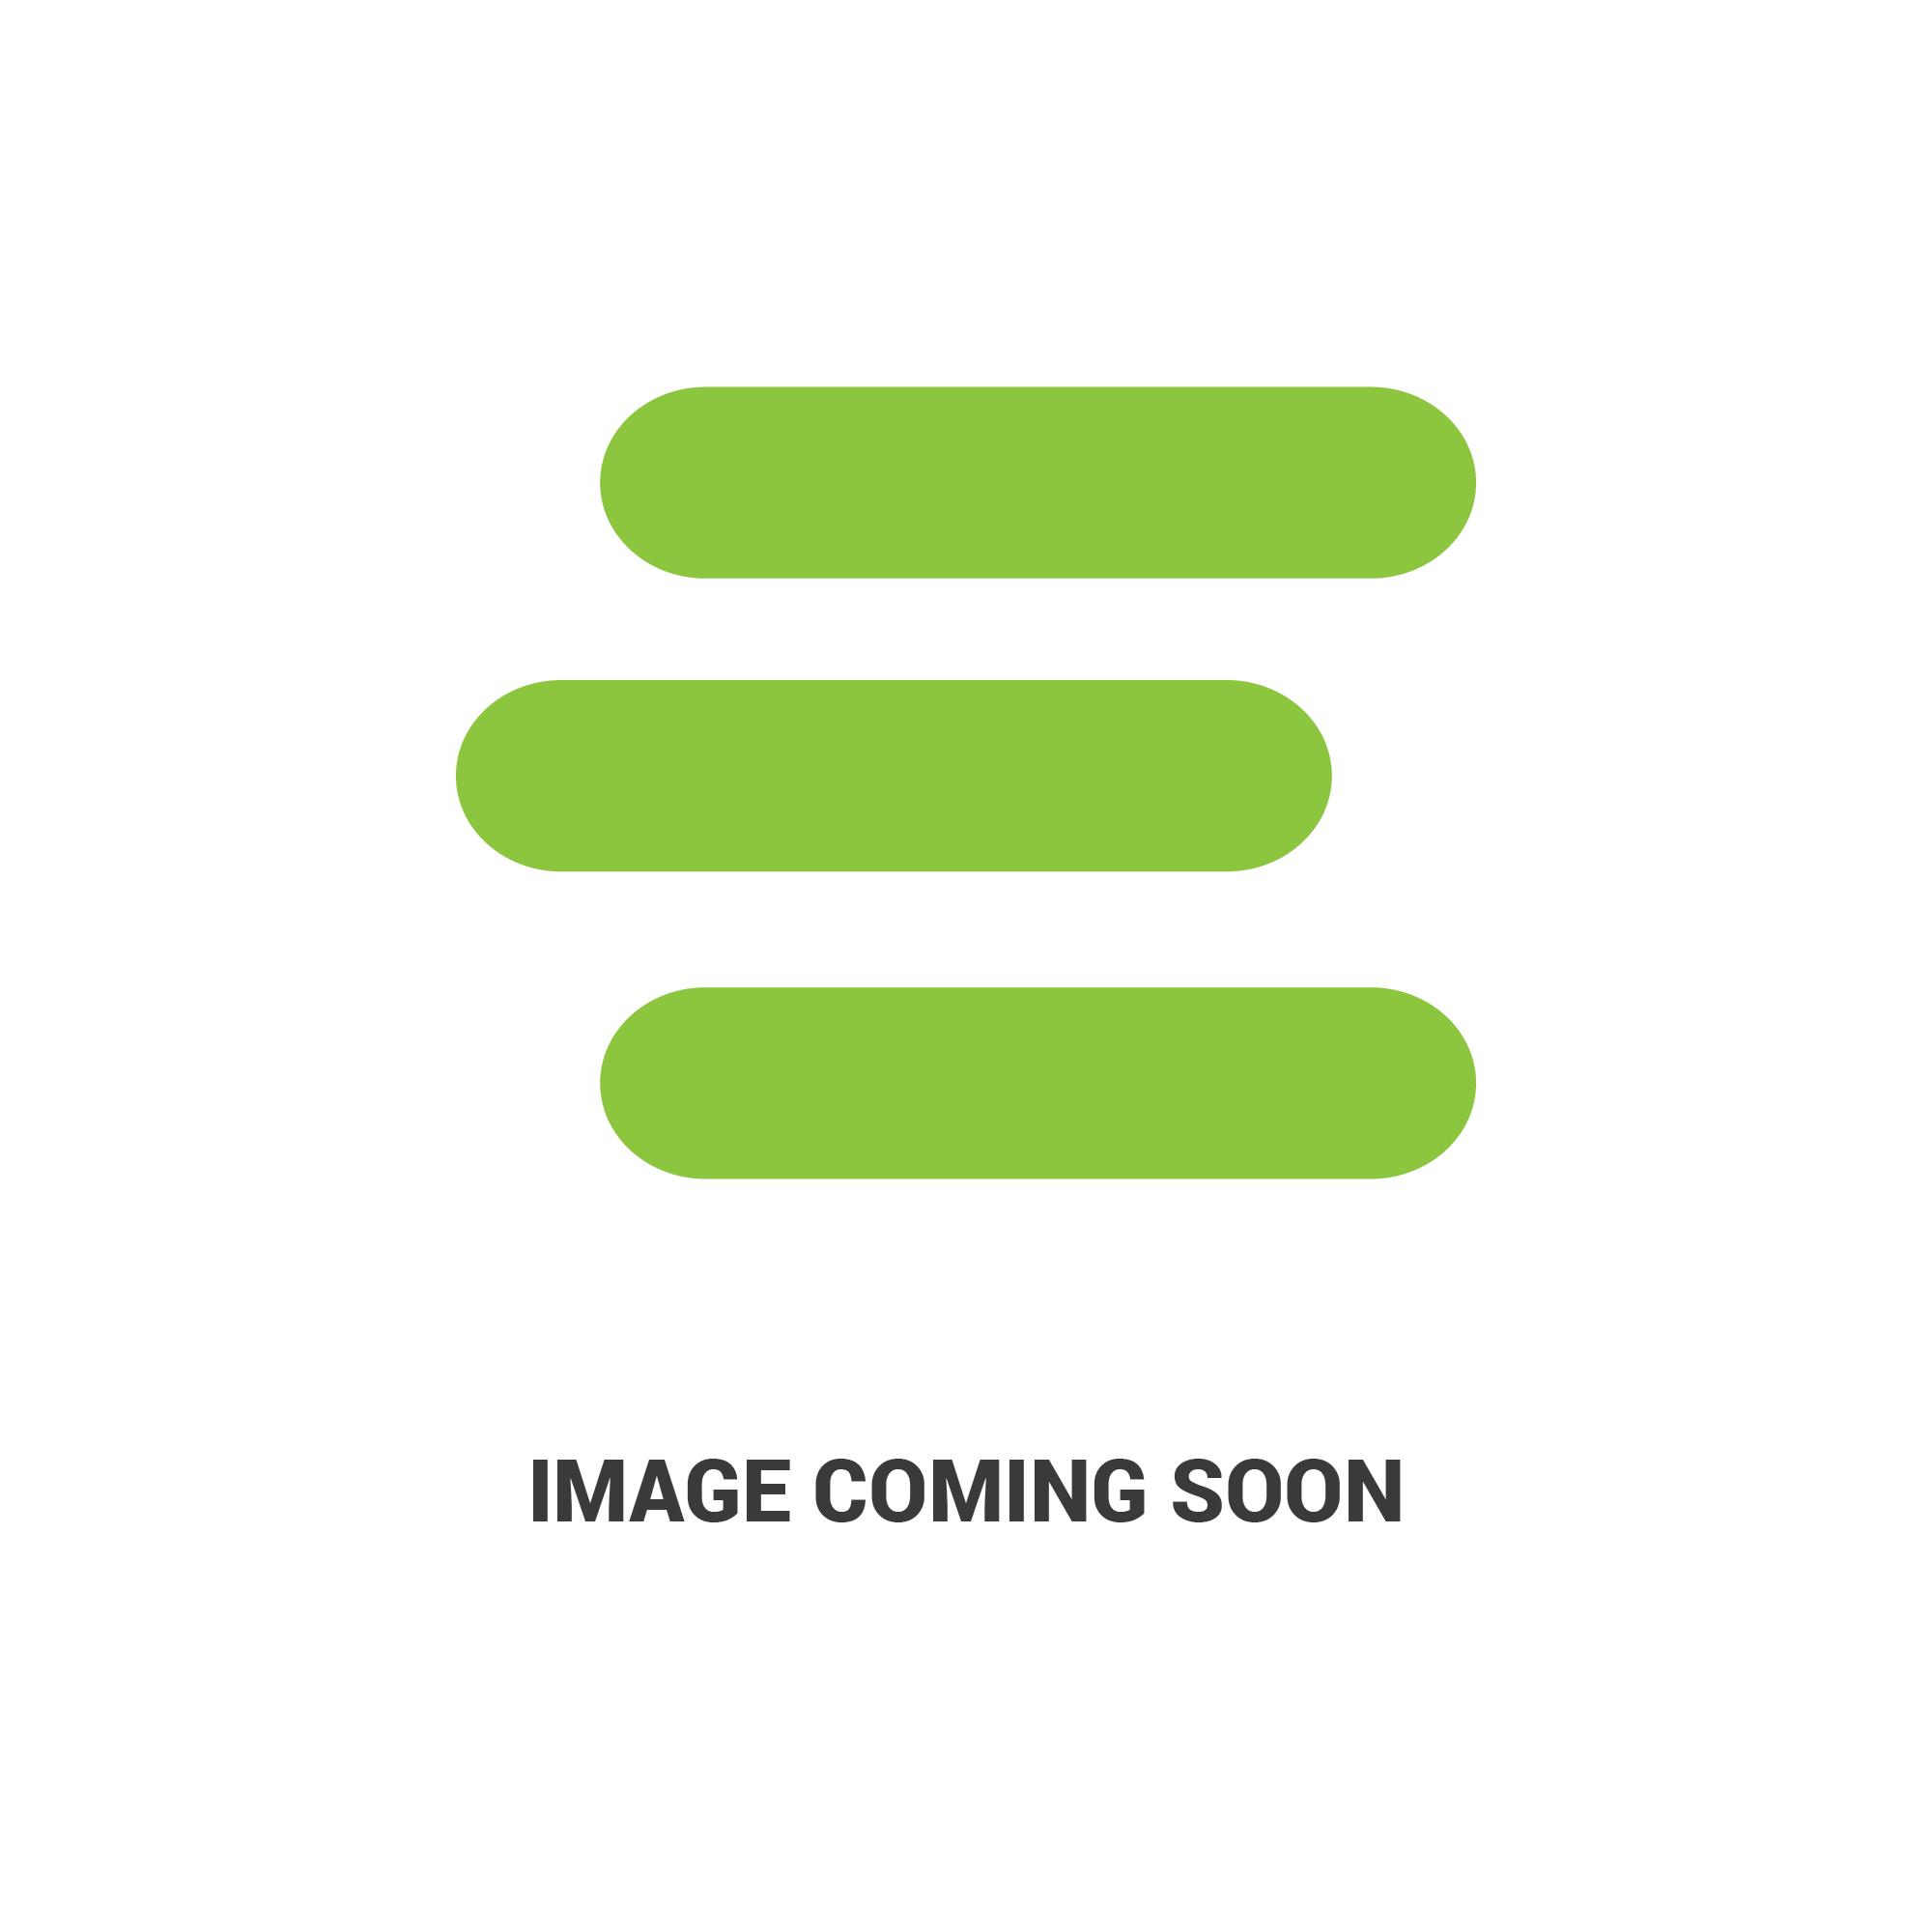 E-17454-74110edit 1.jpg